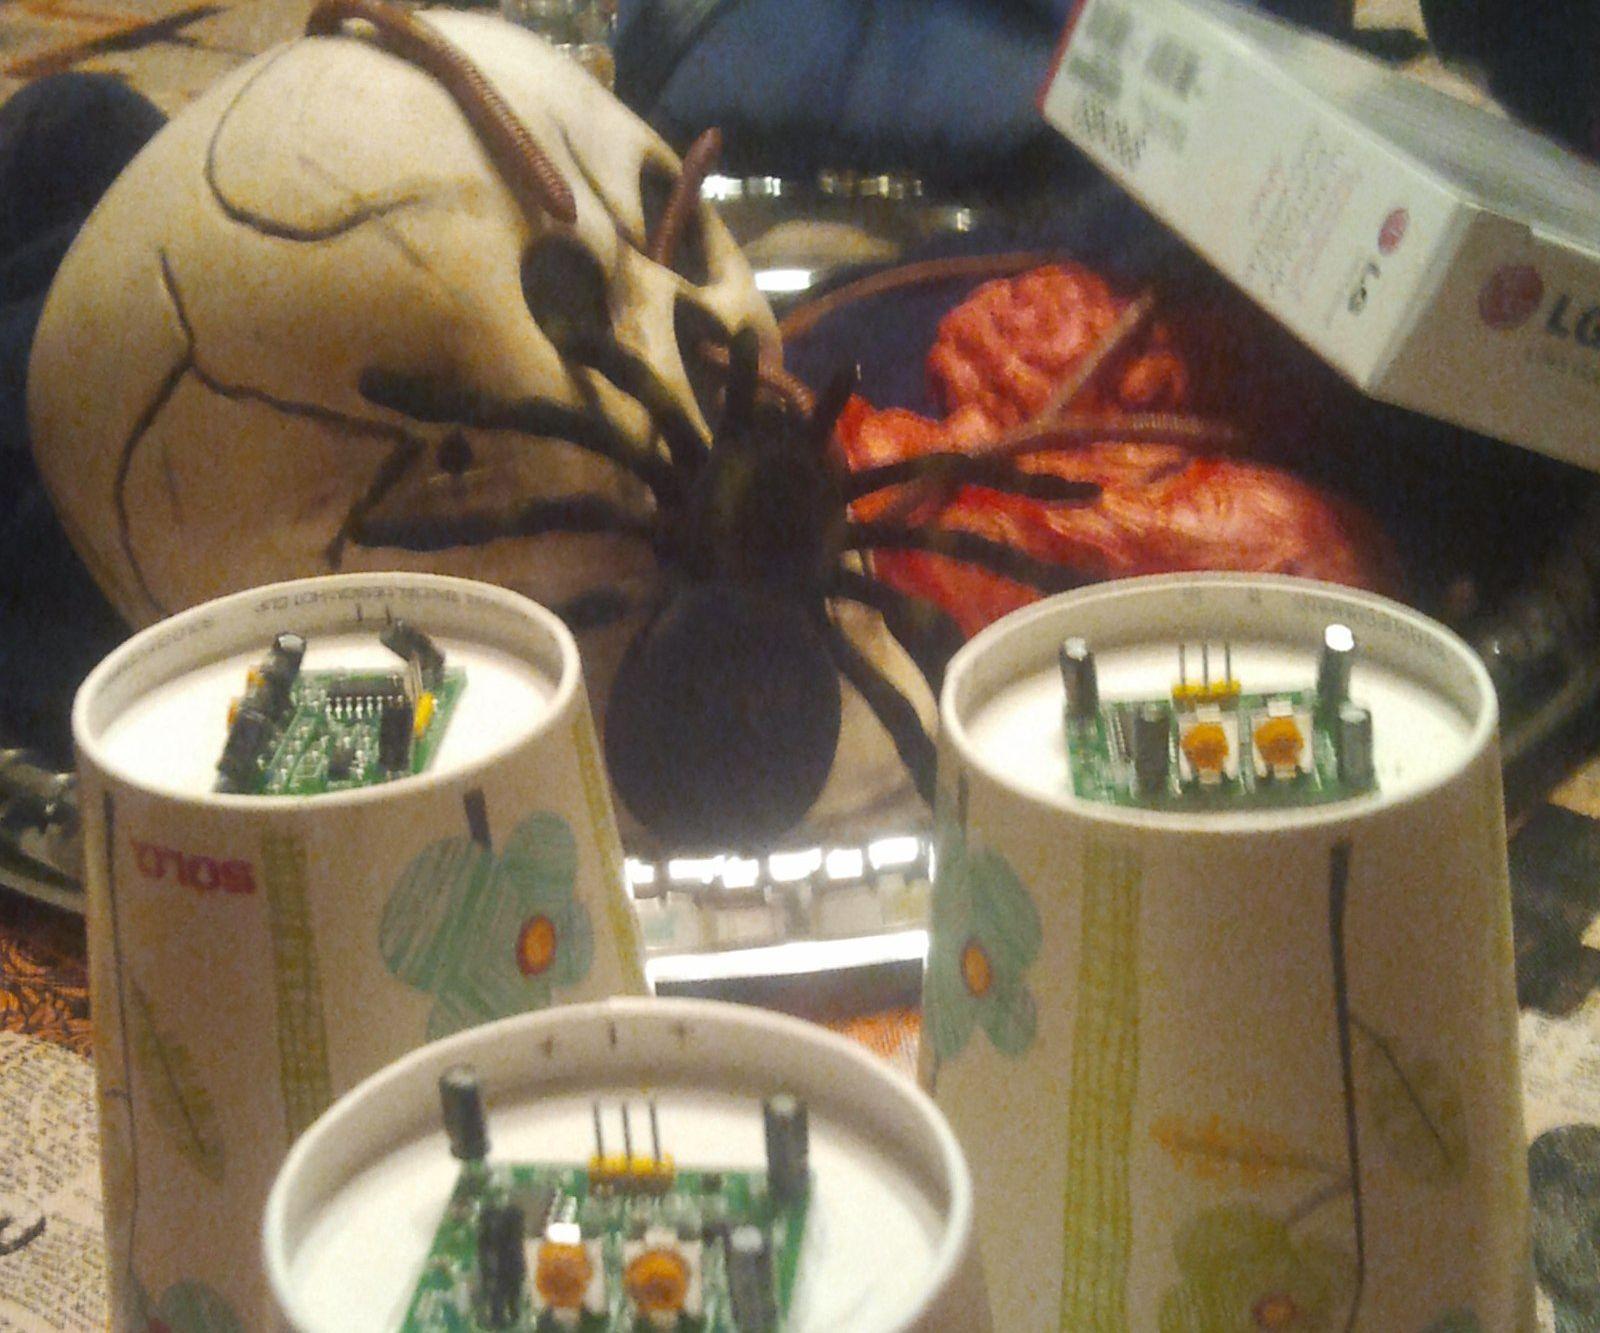 Sensors Trigger Halloween WAV Files